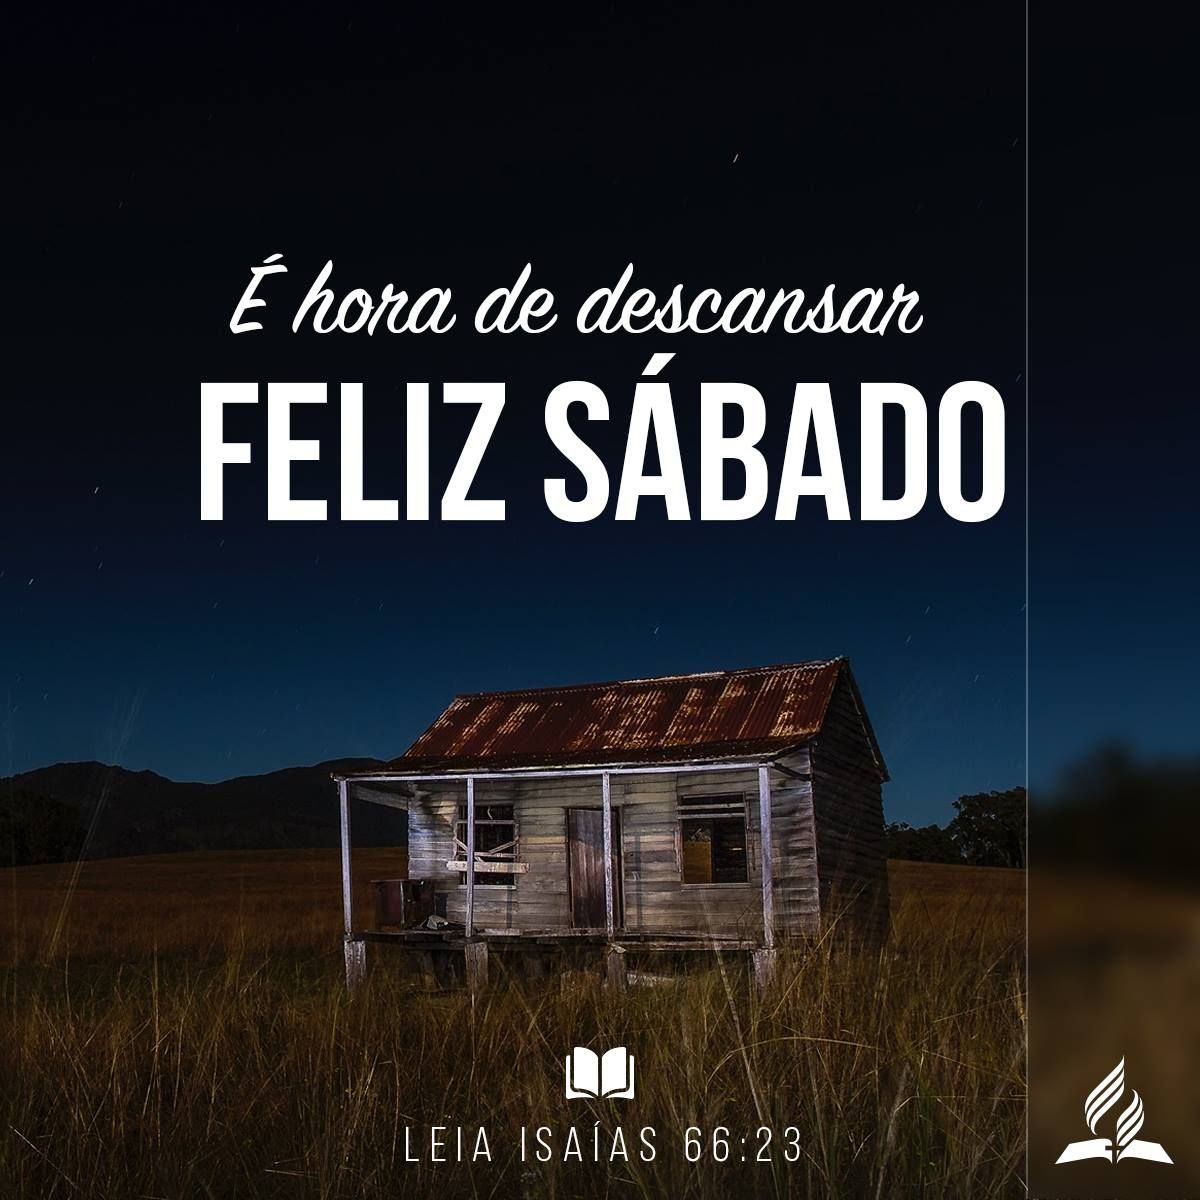 #FelizSabado